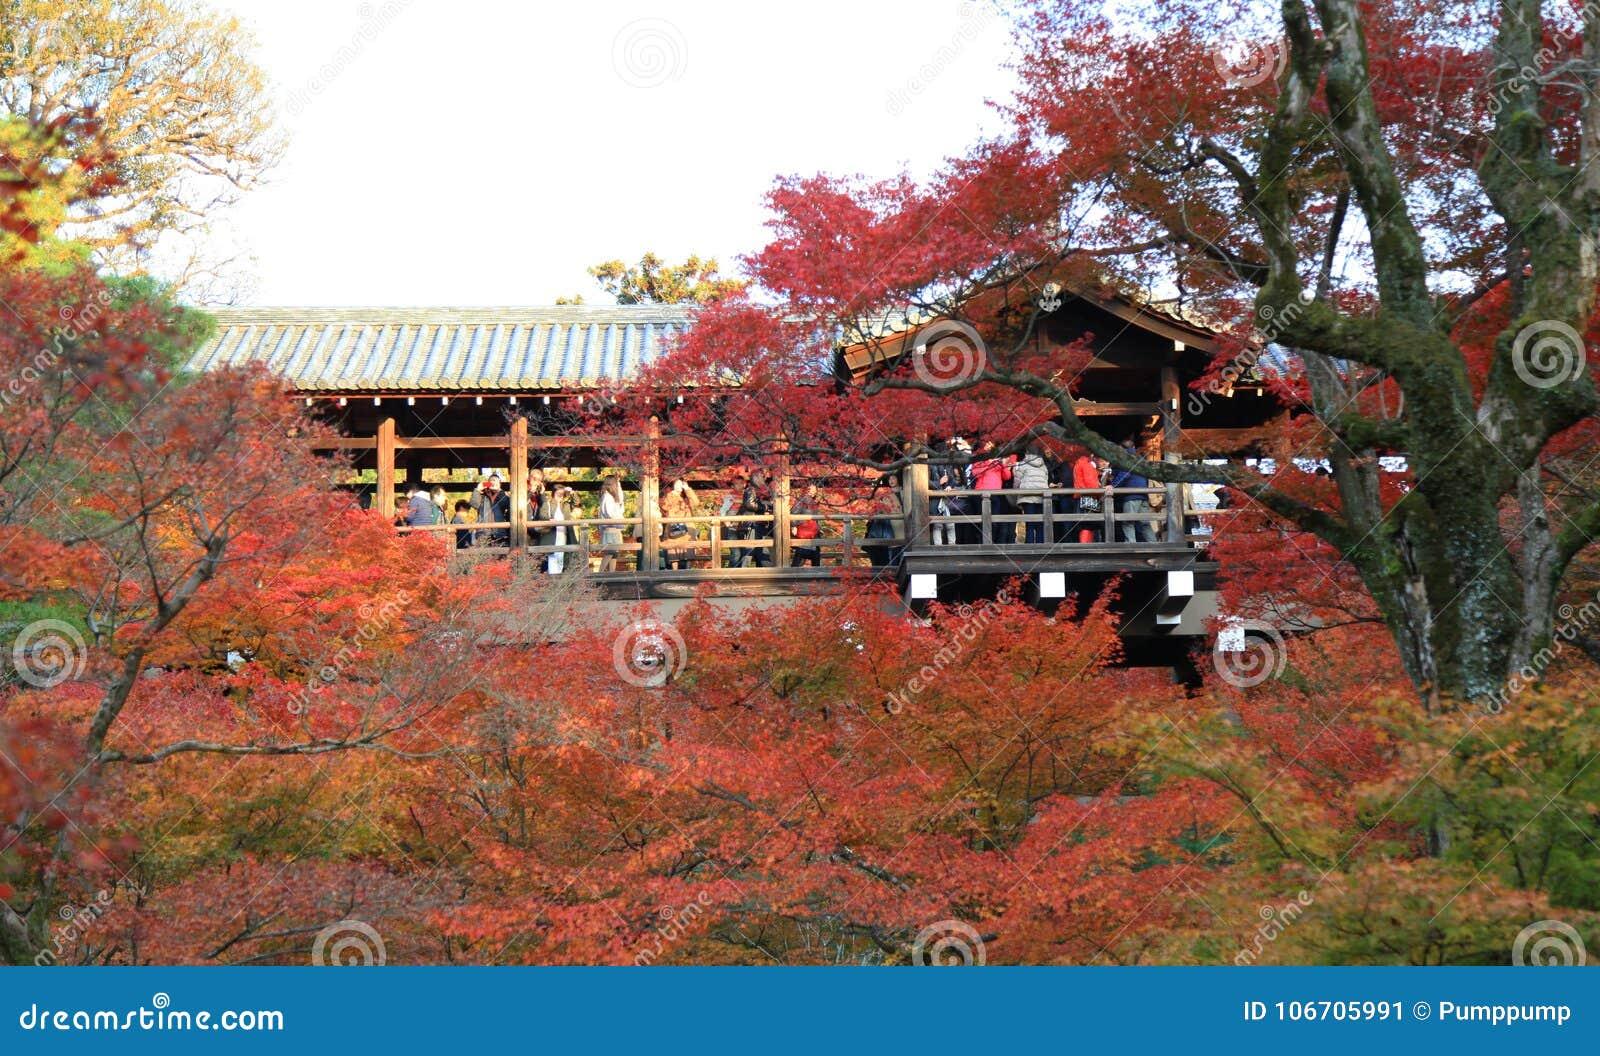 Tofukuji Temple : KYOTO - 25 Nov 2017: Crowds gather at Tofukuj